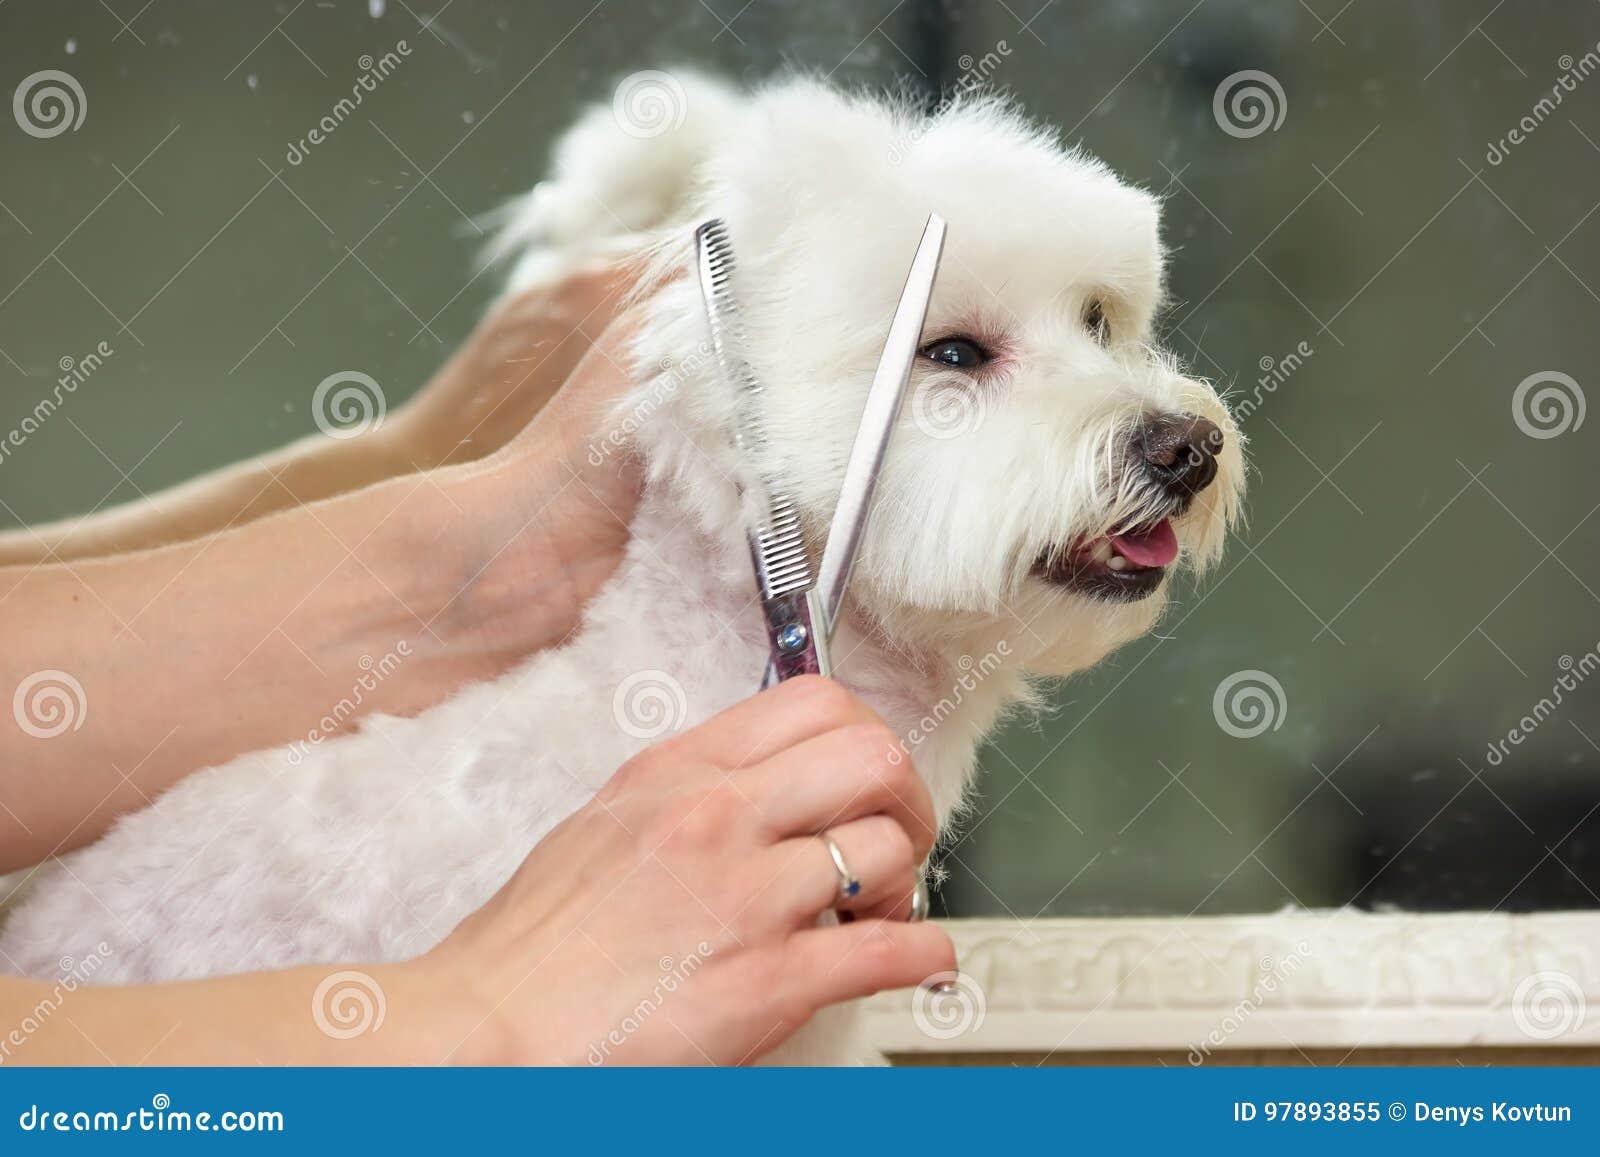 Hände der Frau, Hundepflegen